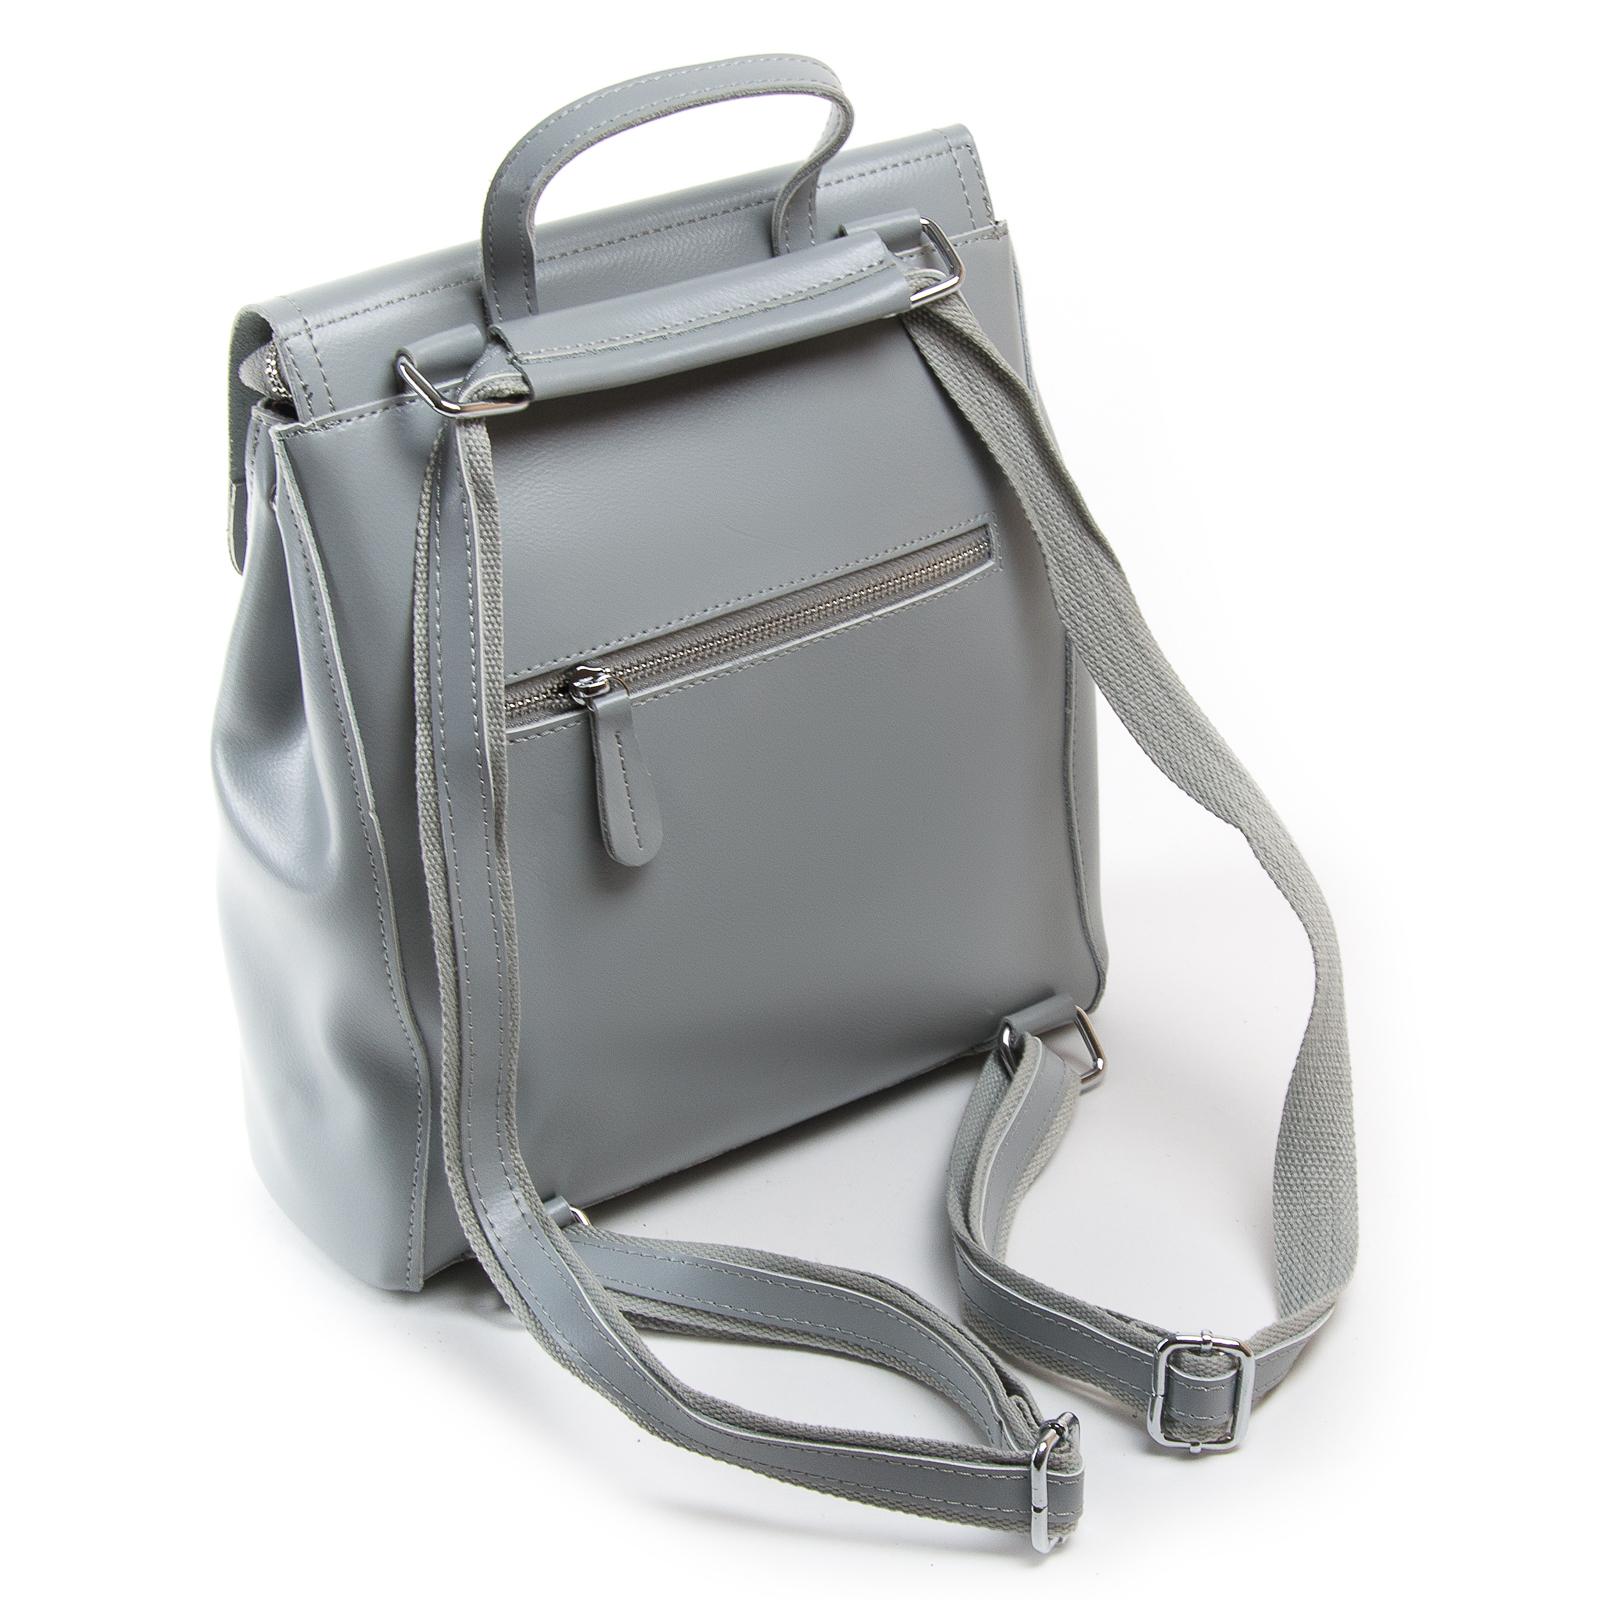 Сумка Женская Рюкзак кожа ALEX RAI 1005 l-grey - фото 4